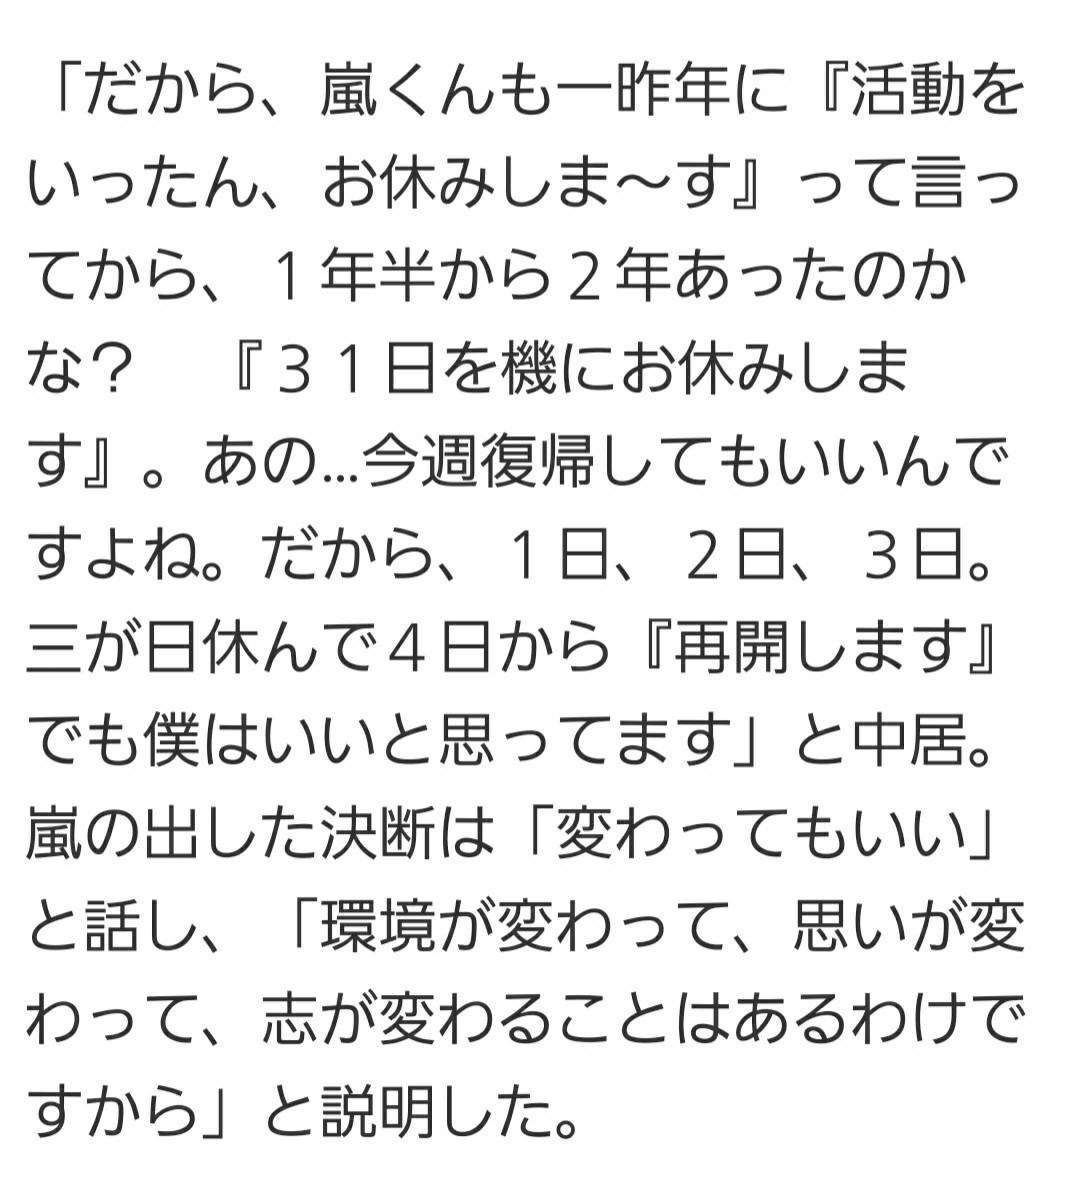 f:id:yoshiakito:20210111220457j:image